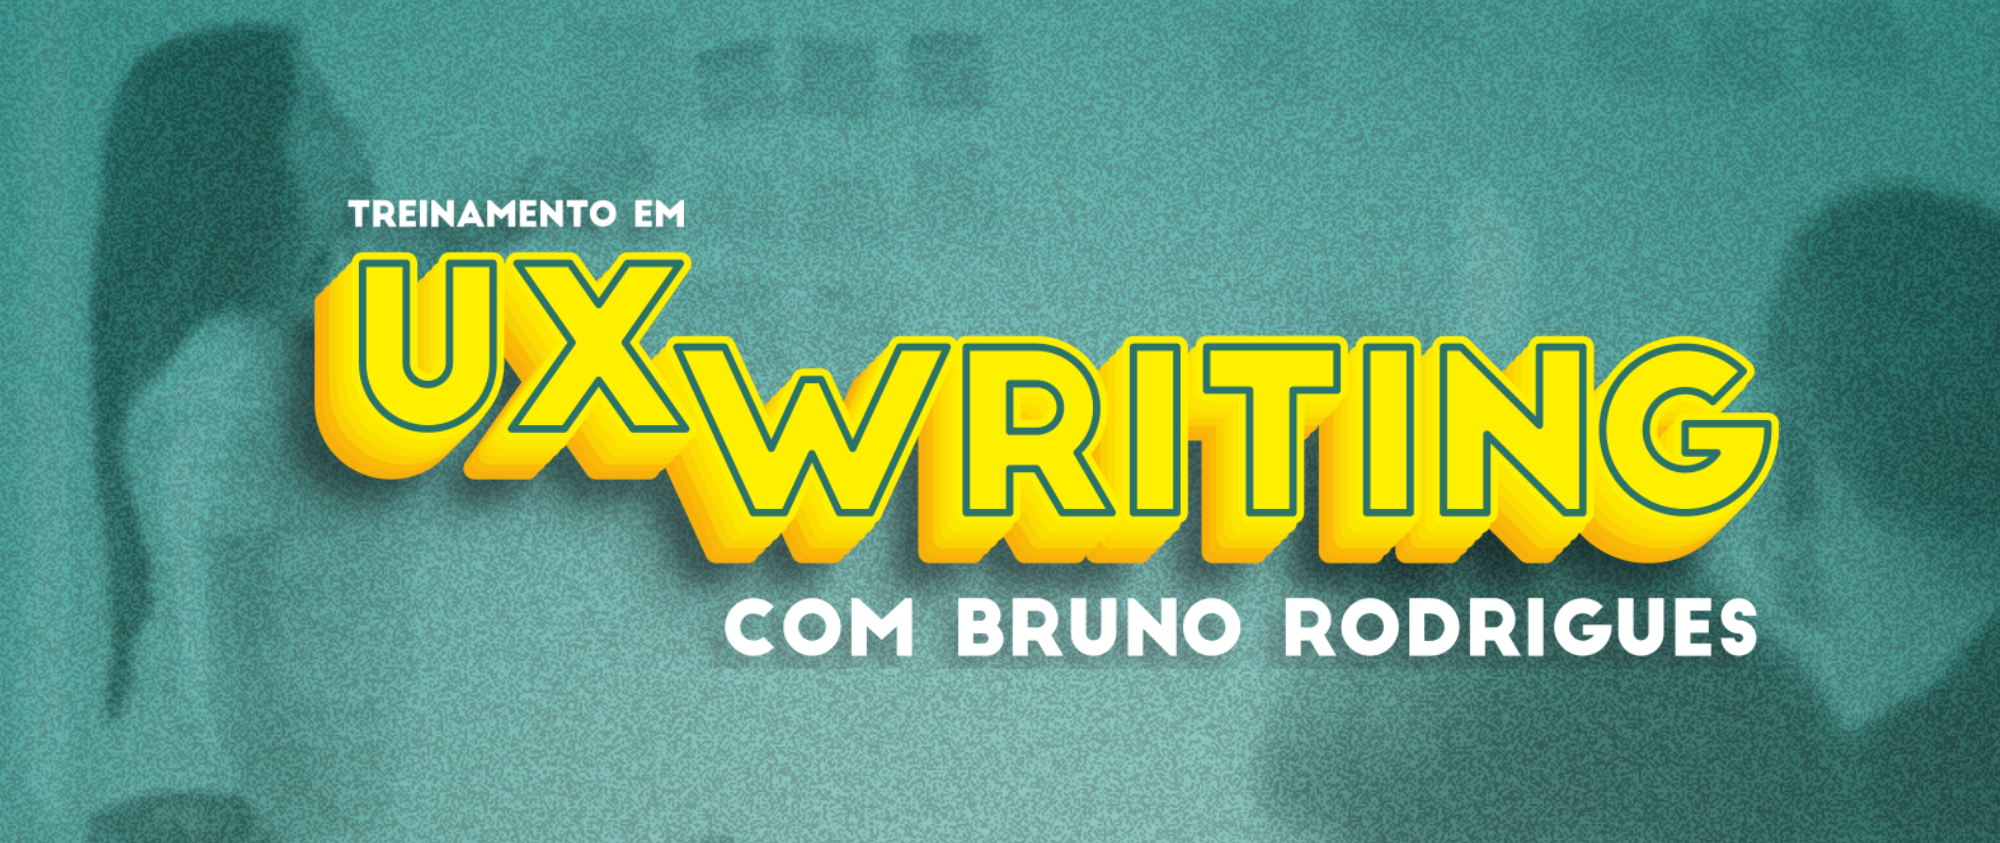 Treinamento UX Writing - Recife